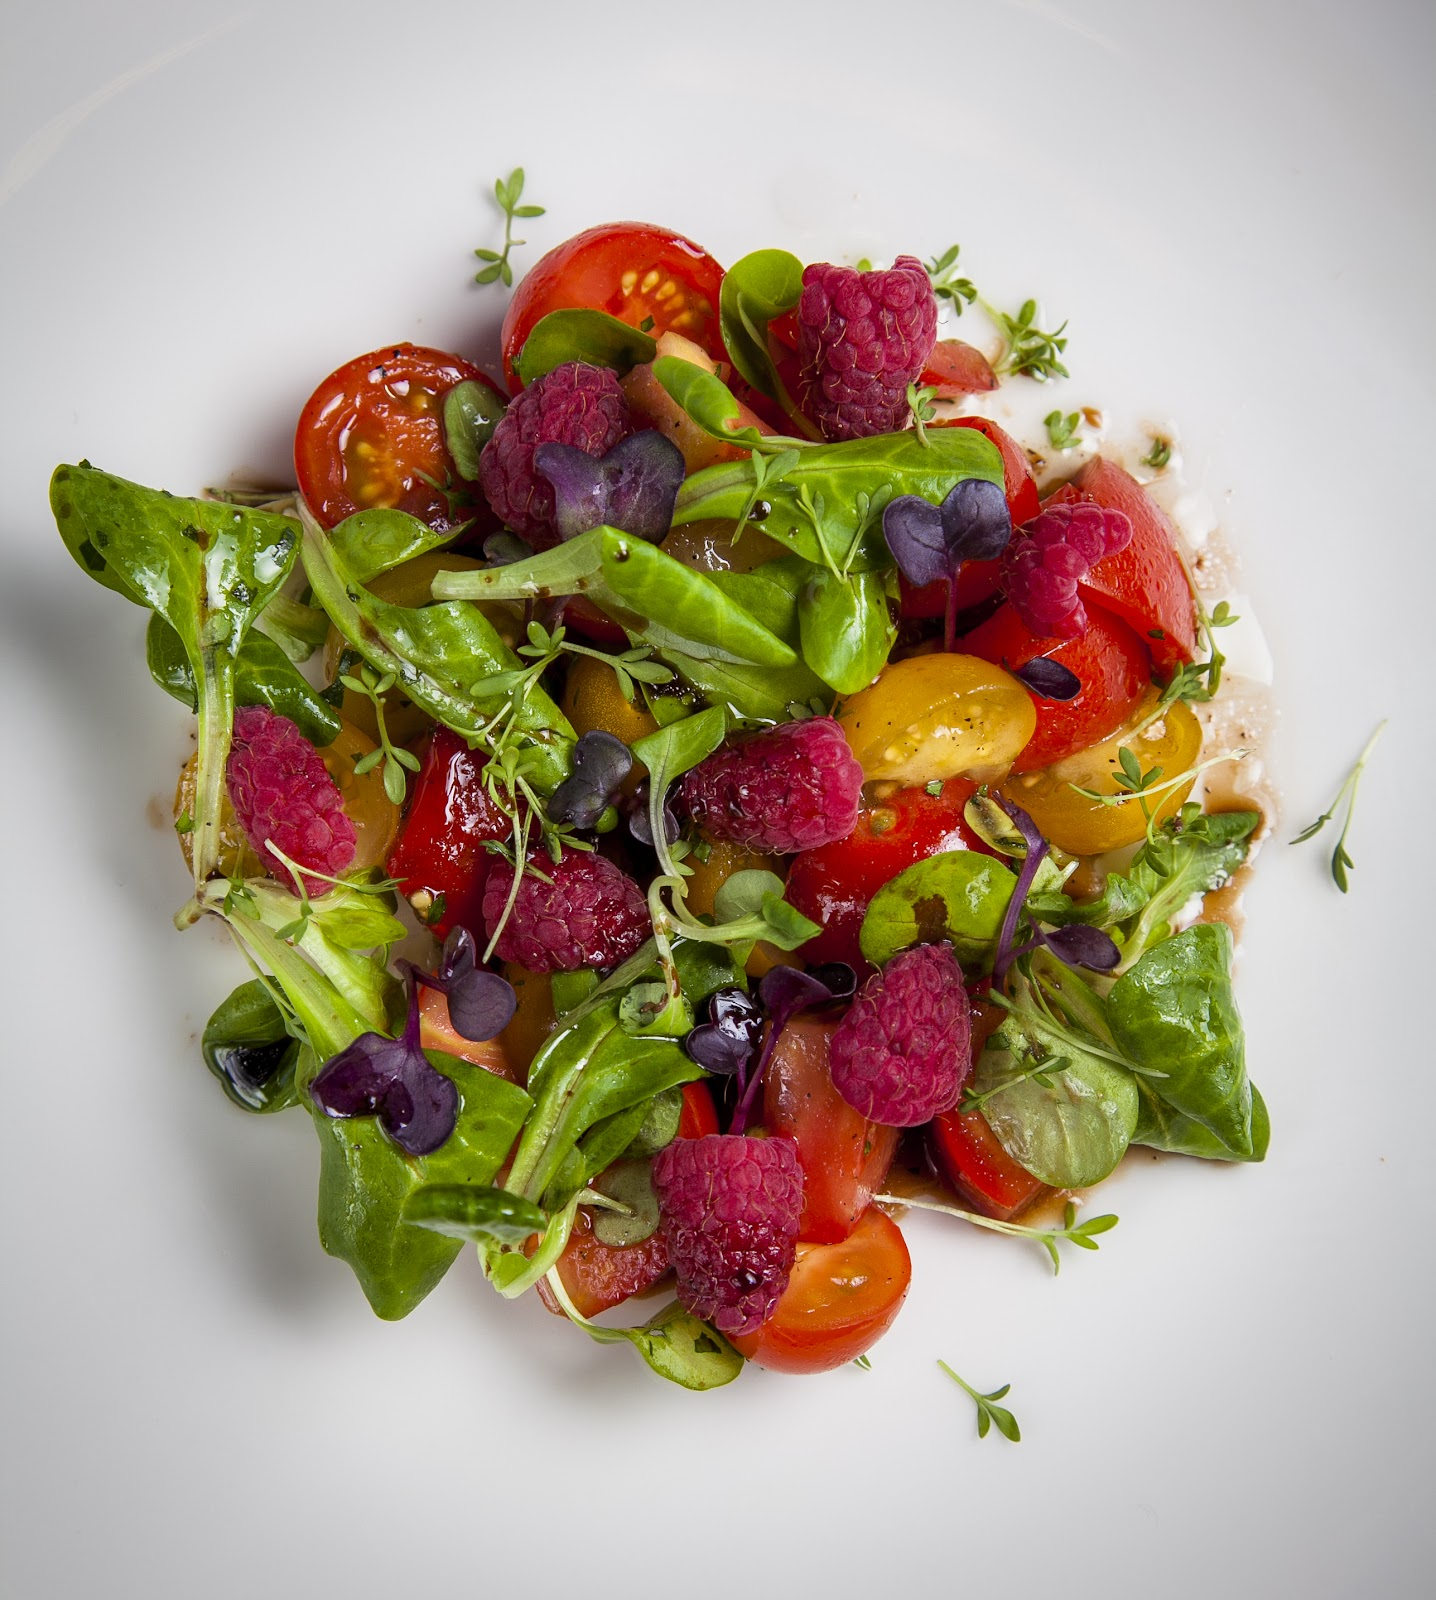 Tarantino_salat s tomatami i malinoq.jpg